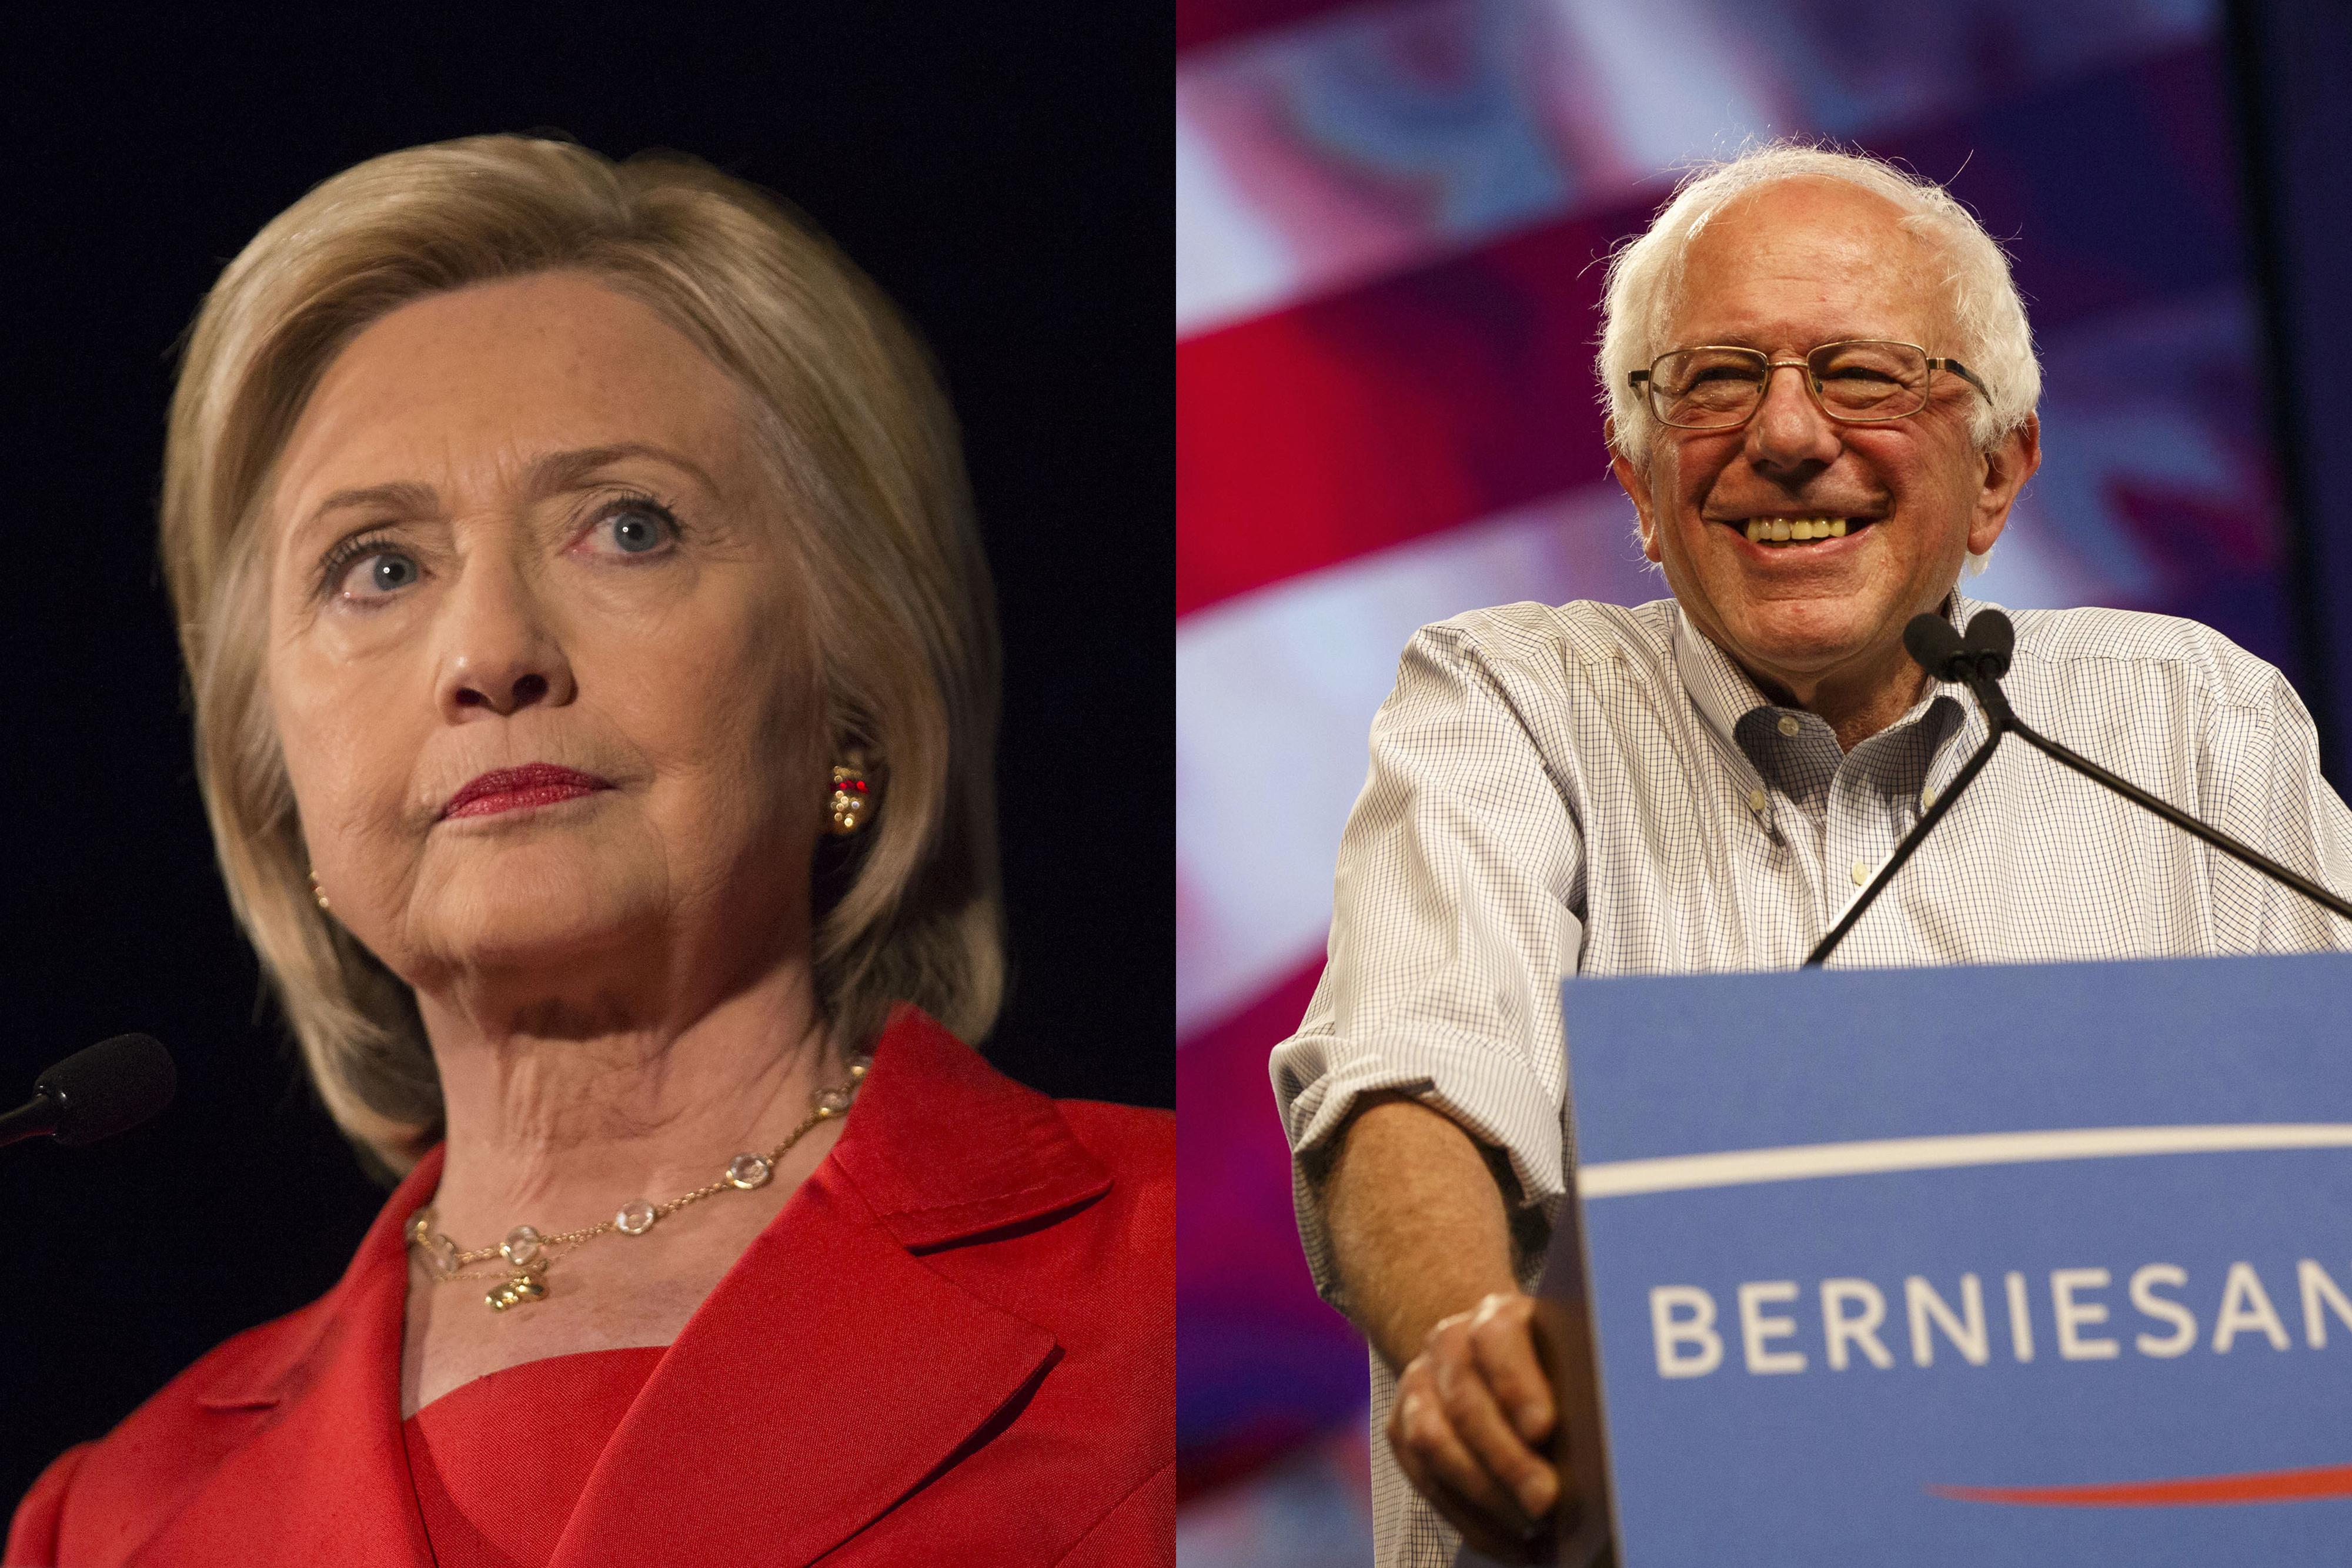 Left: Democratic presidential candidate Hillary Clinton in July 17, 2015; Right: U.S. Senator Bernie Sanders in Aug. 2015.